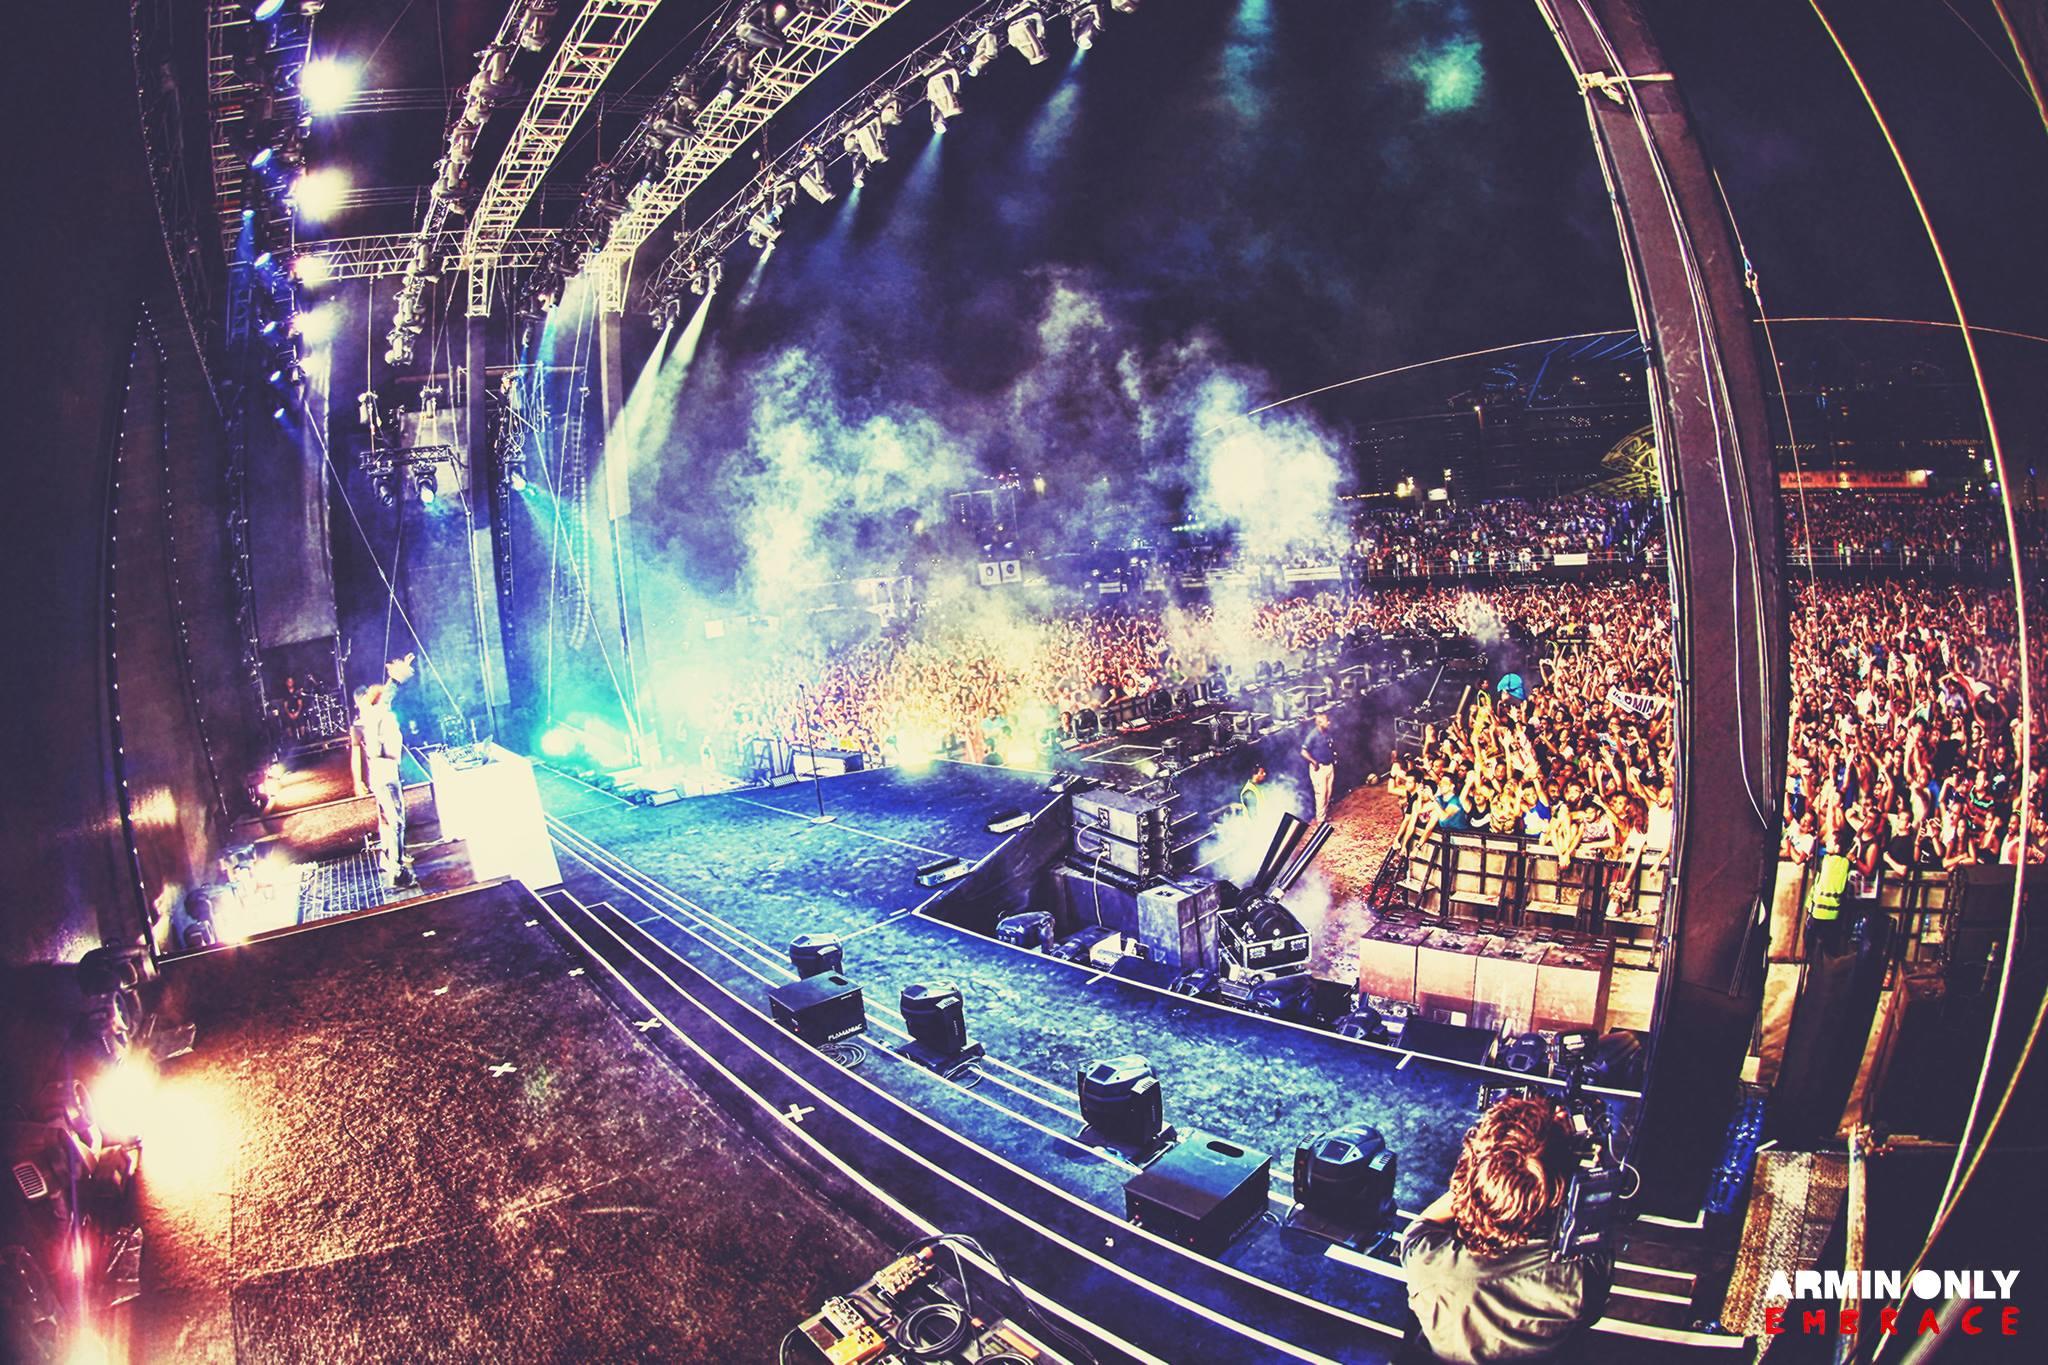 Armin Only Embrace sacudiu Dubai na sexta feira.